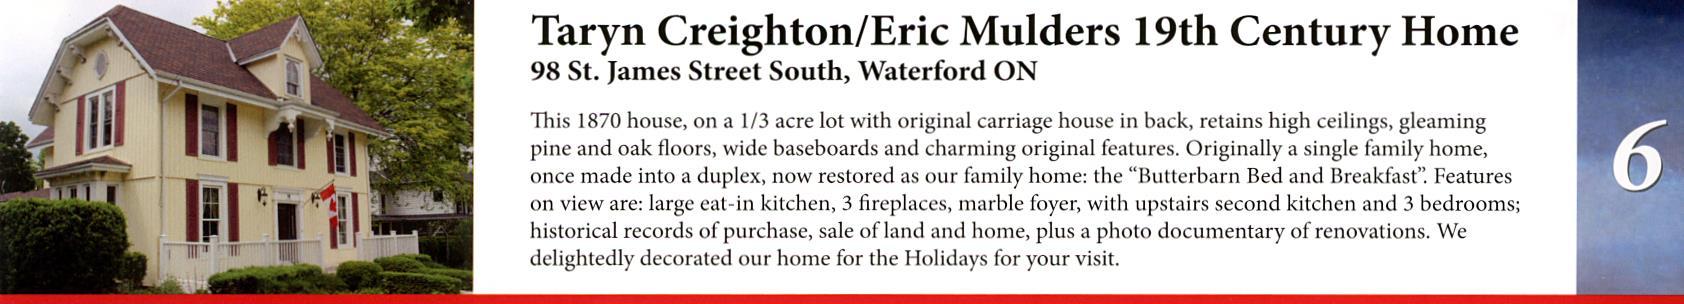 Taryn Creigton/Eric Mulders 19th Century Home